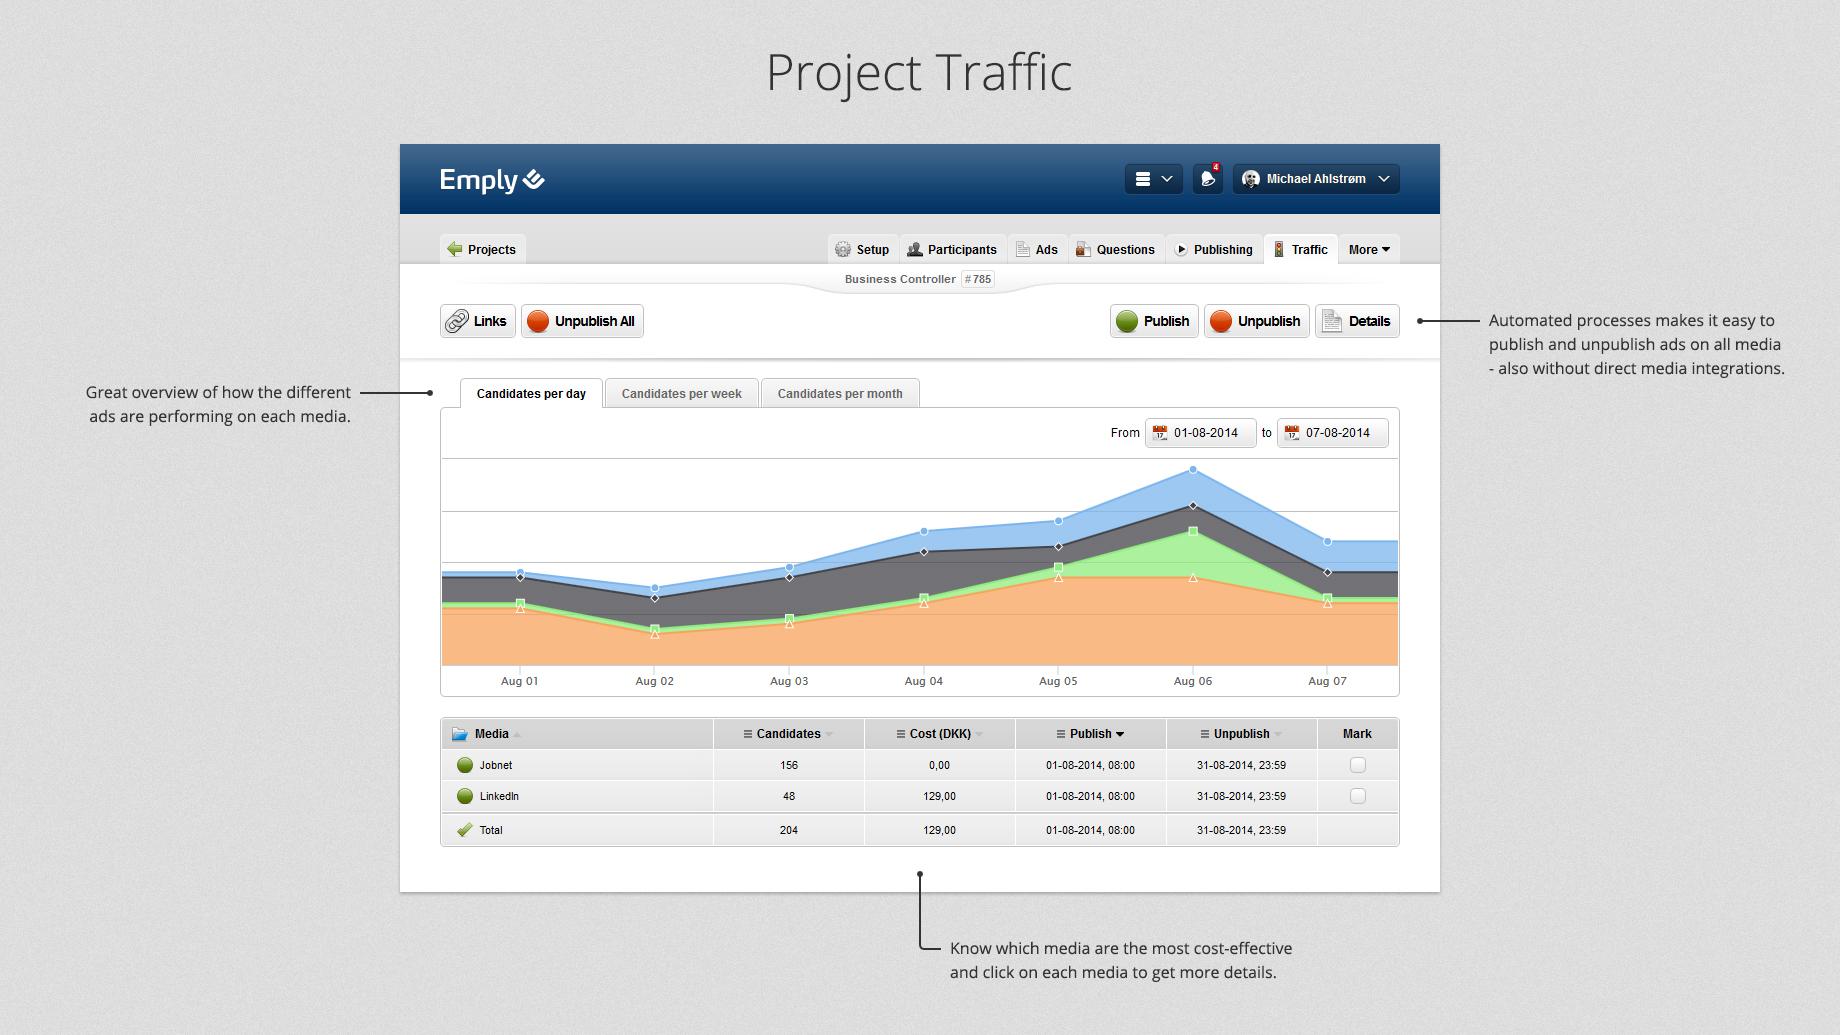 Project Traffic